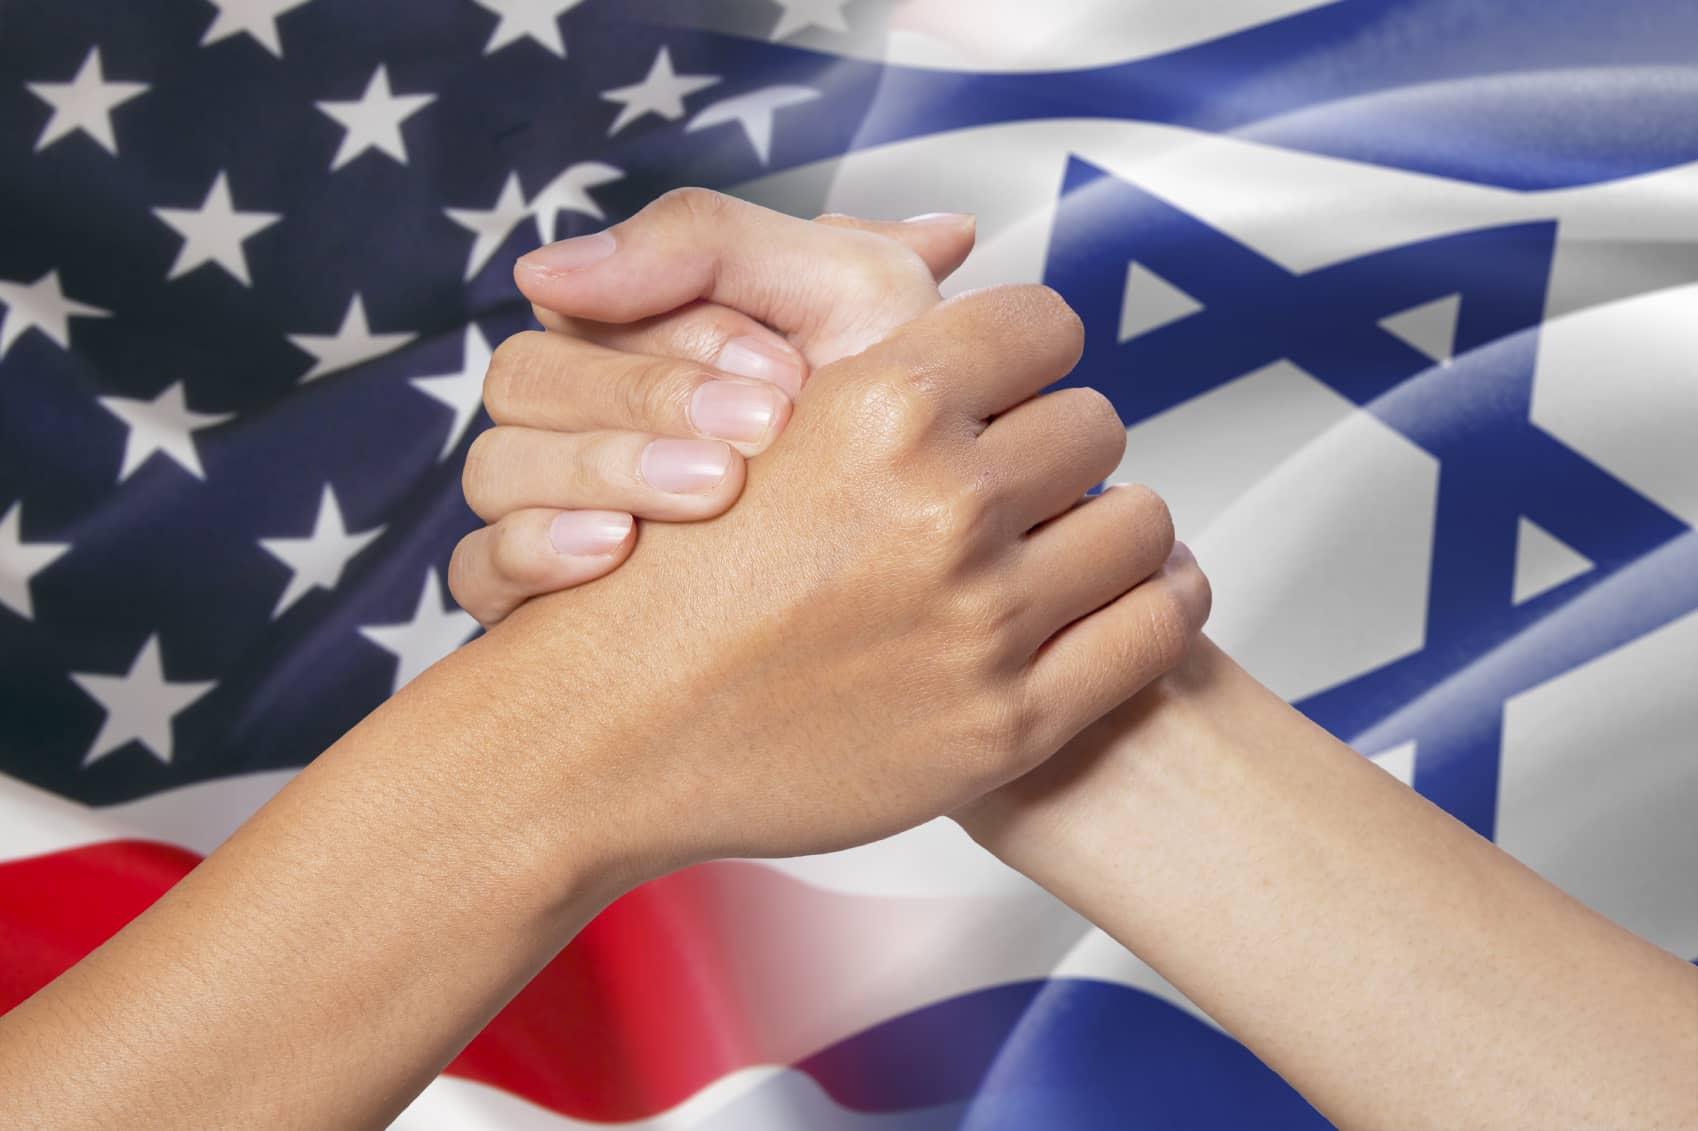 iStock_000073227017_Medium U.S.-Israel Program Seeks Proposals For Collaborative Renewables Projects